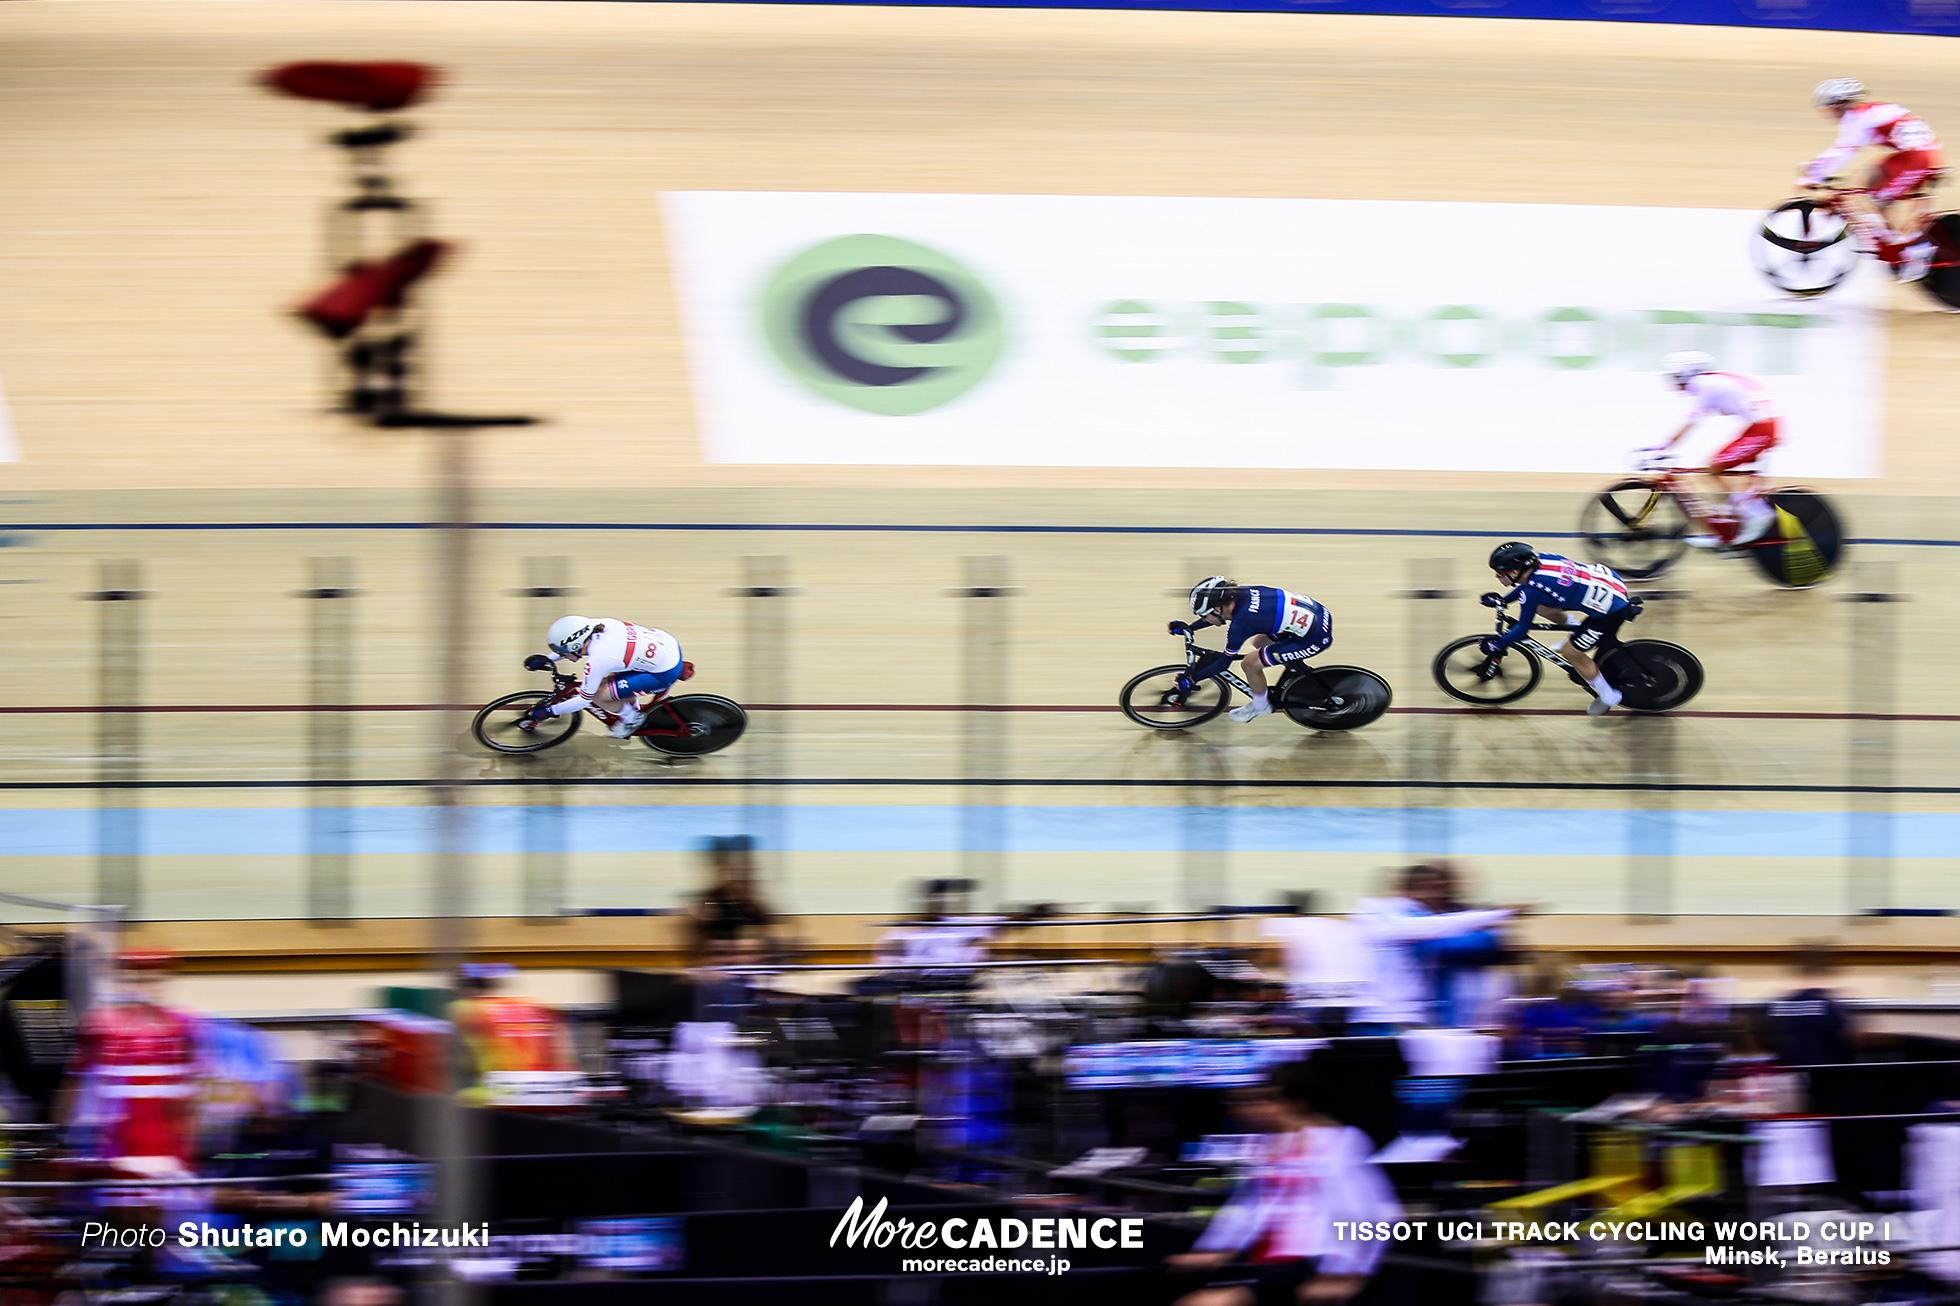 Women's Madison / TISSOT UCI TRACK CYCLING WORLD CUP I, Minsk, Beralus